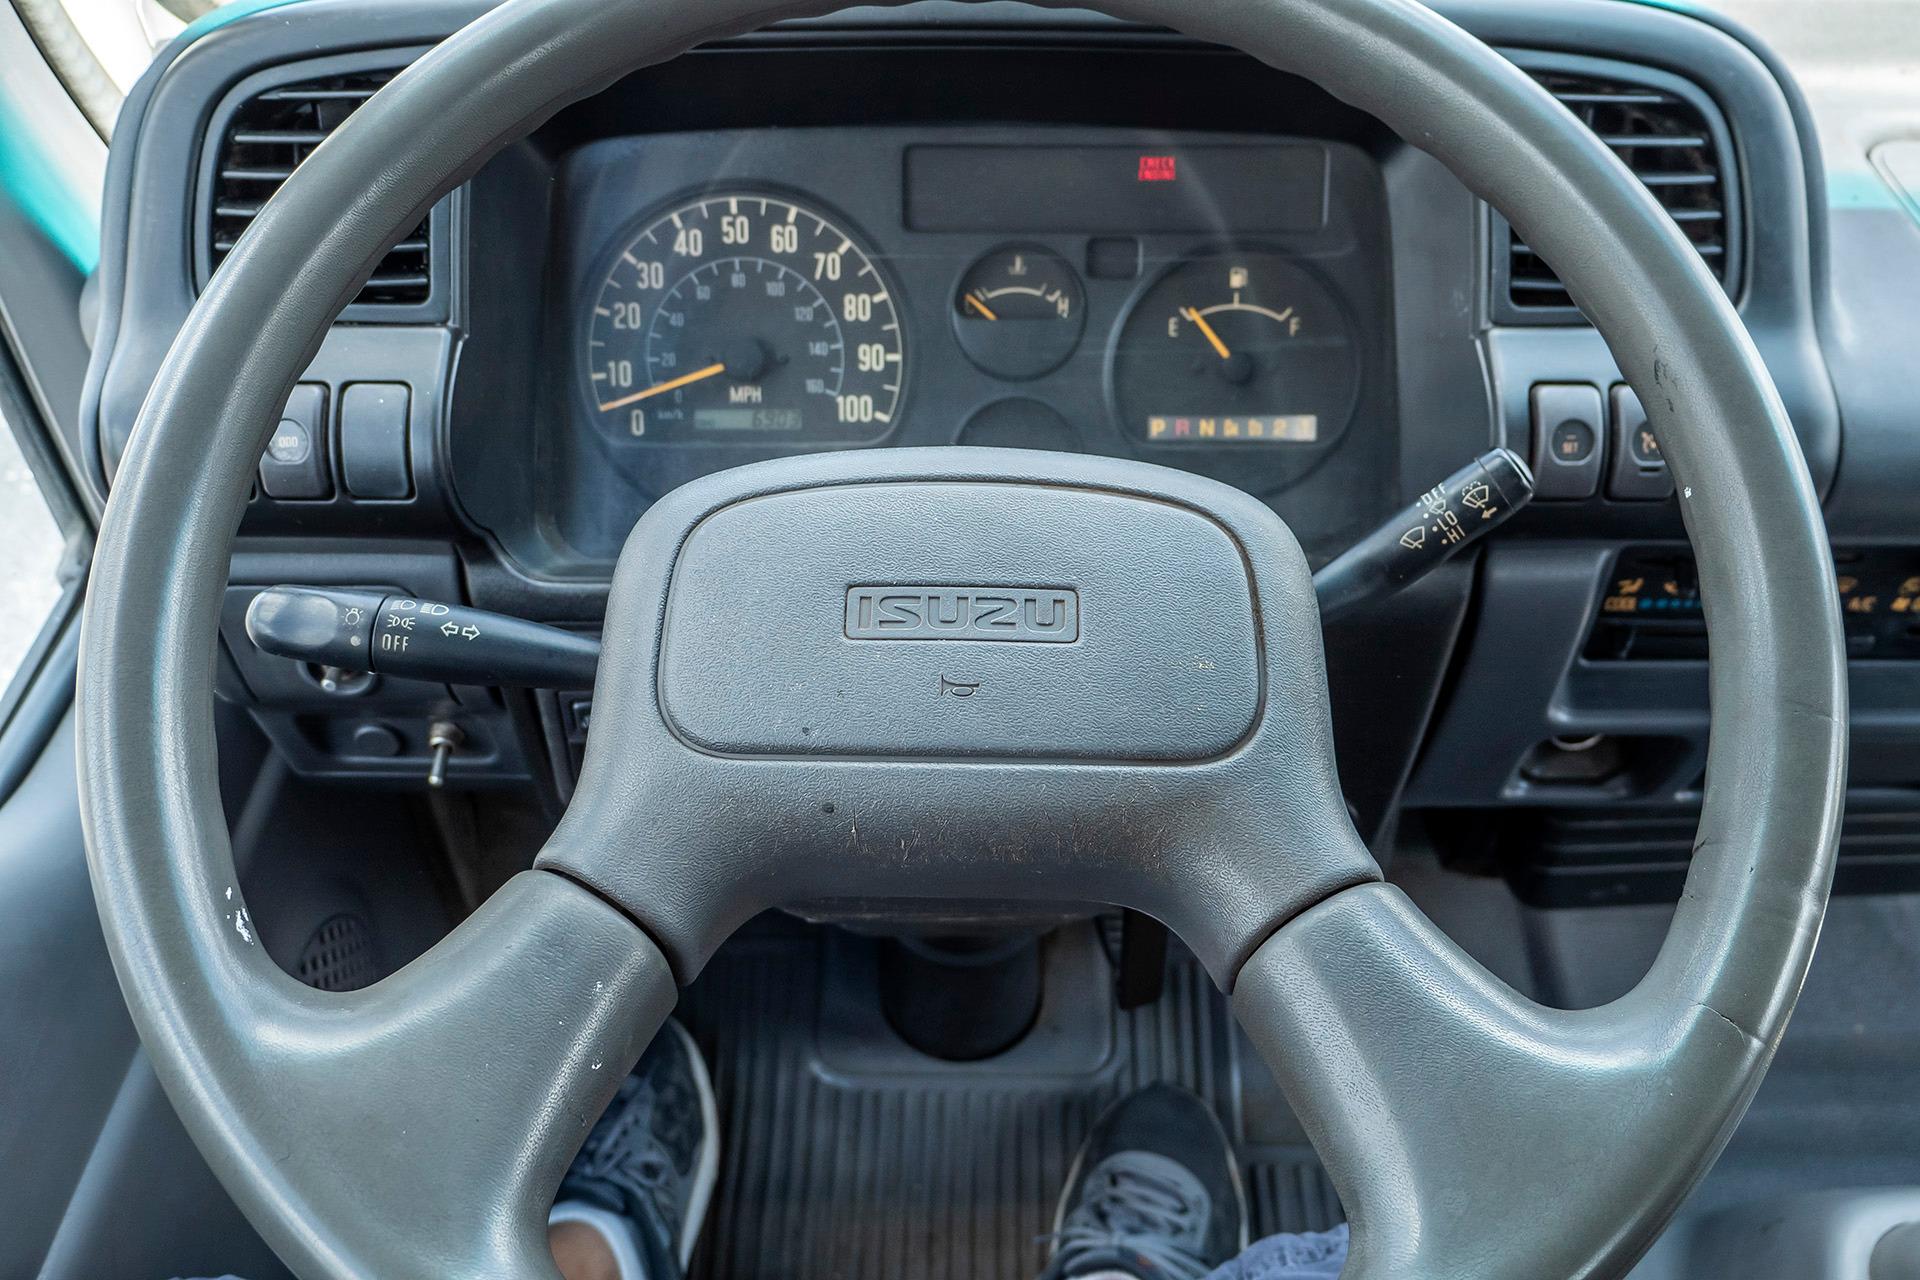 Used-2007-Isuzu-NPR-Flatbed-Equipment